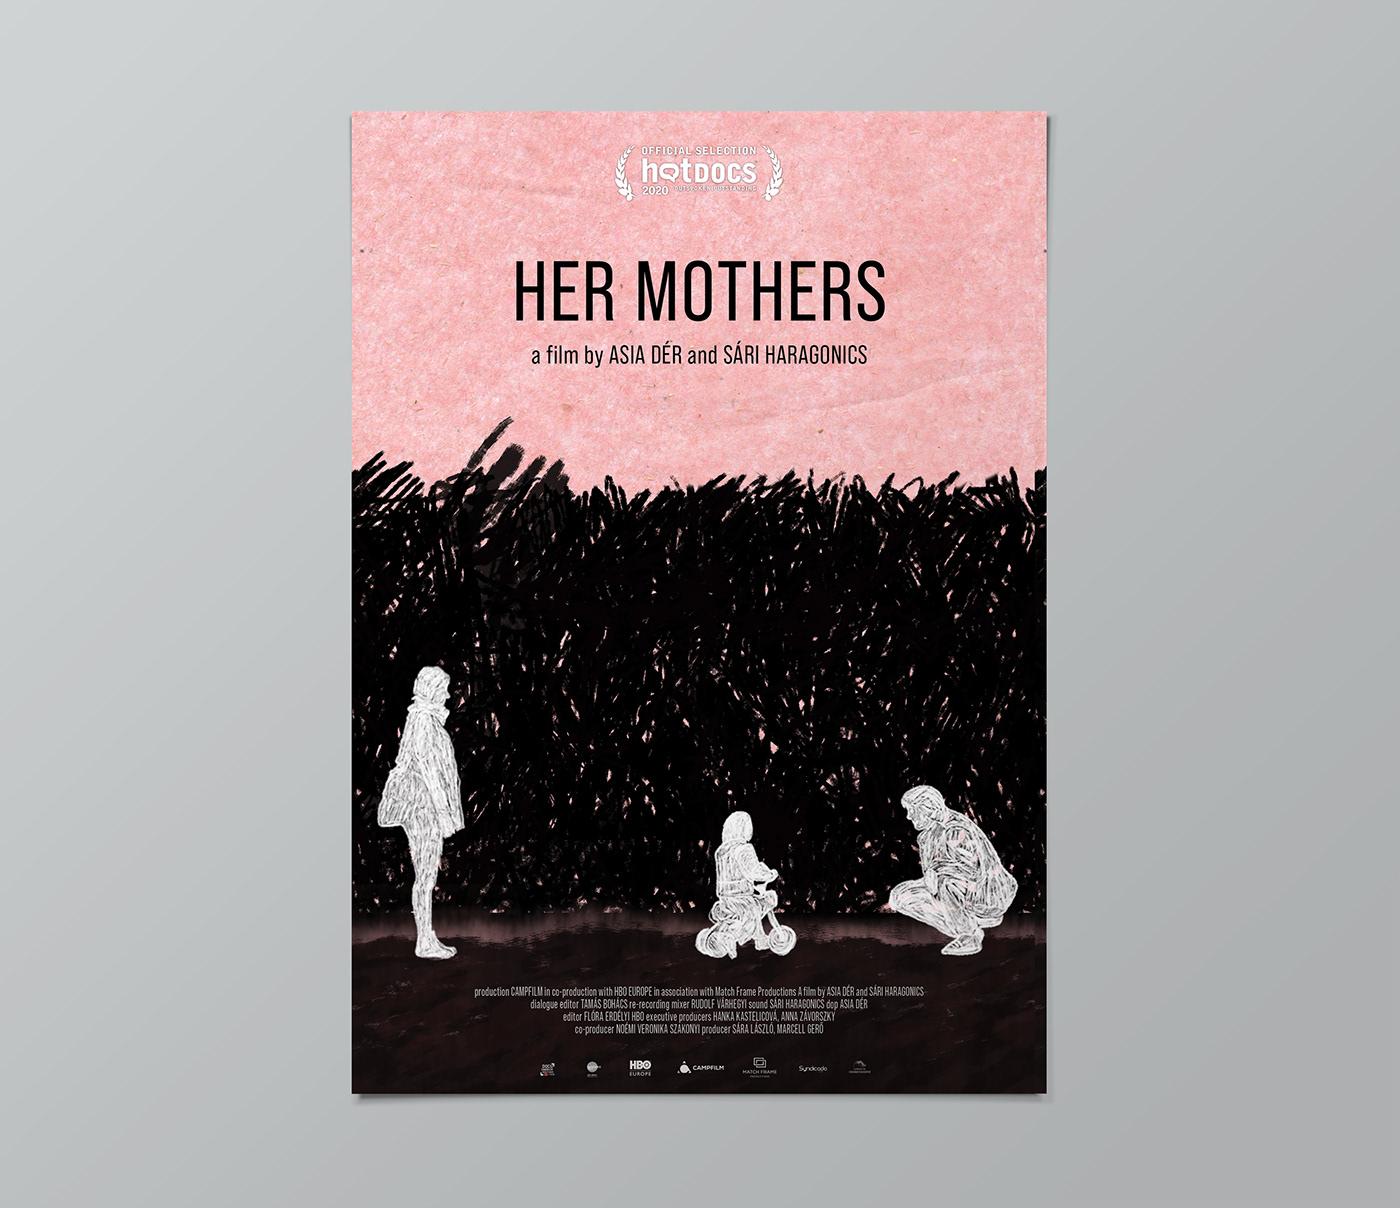 Cinema Documentary  mothers movie Movie graphics movie poster press kit rainbowfamily scribble textures